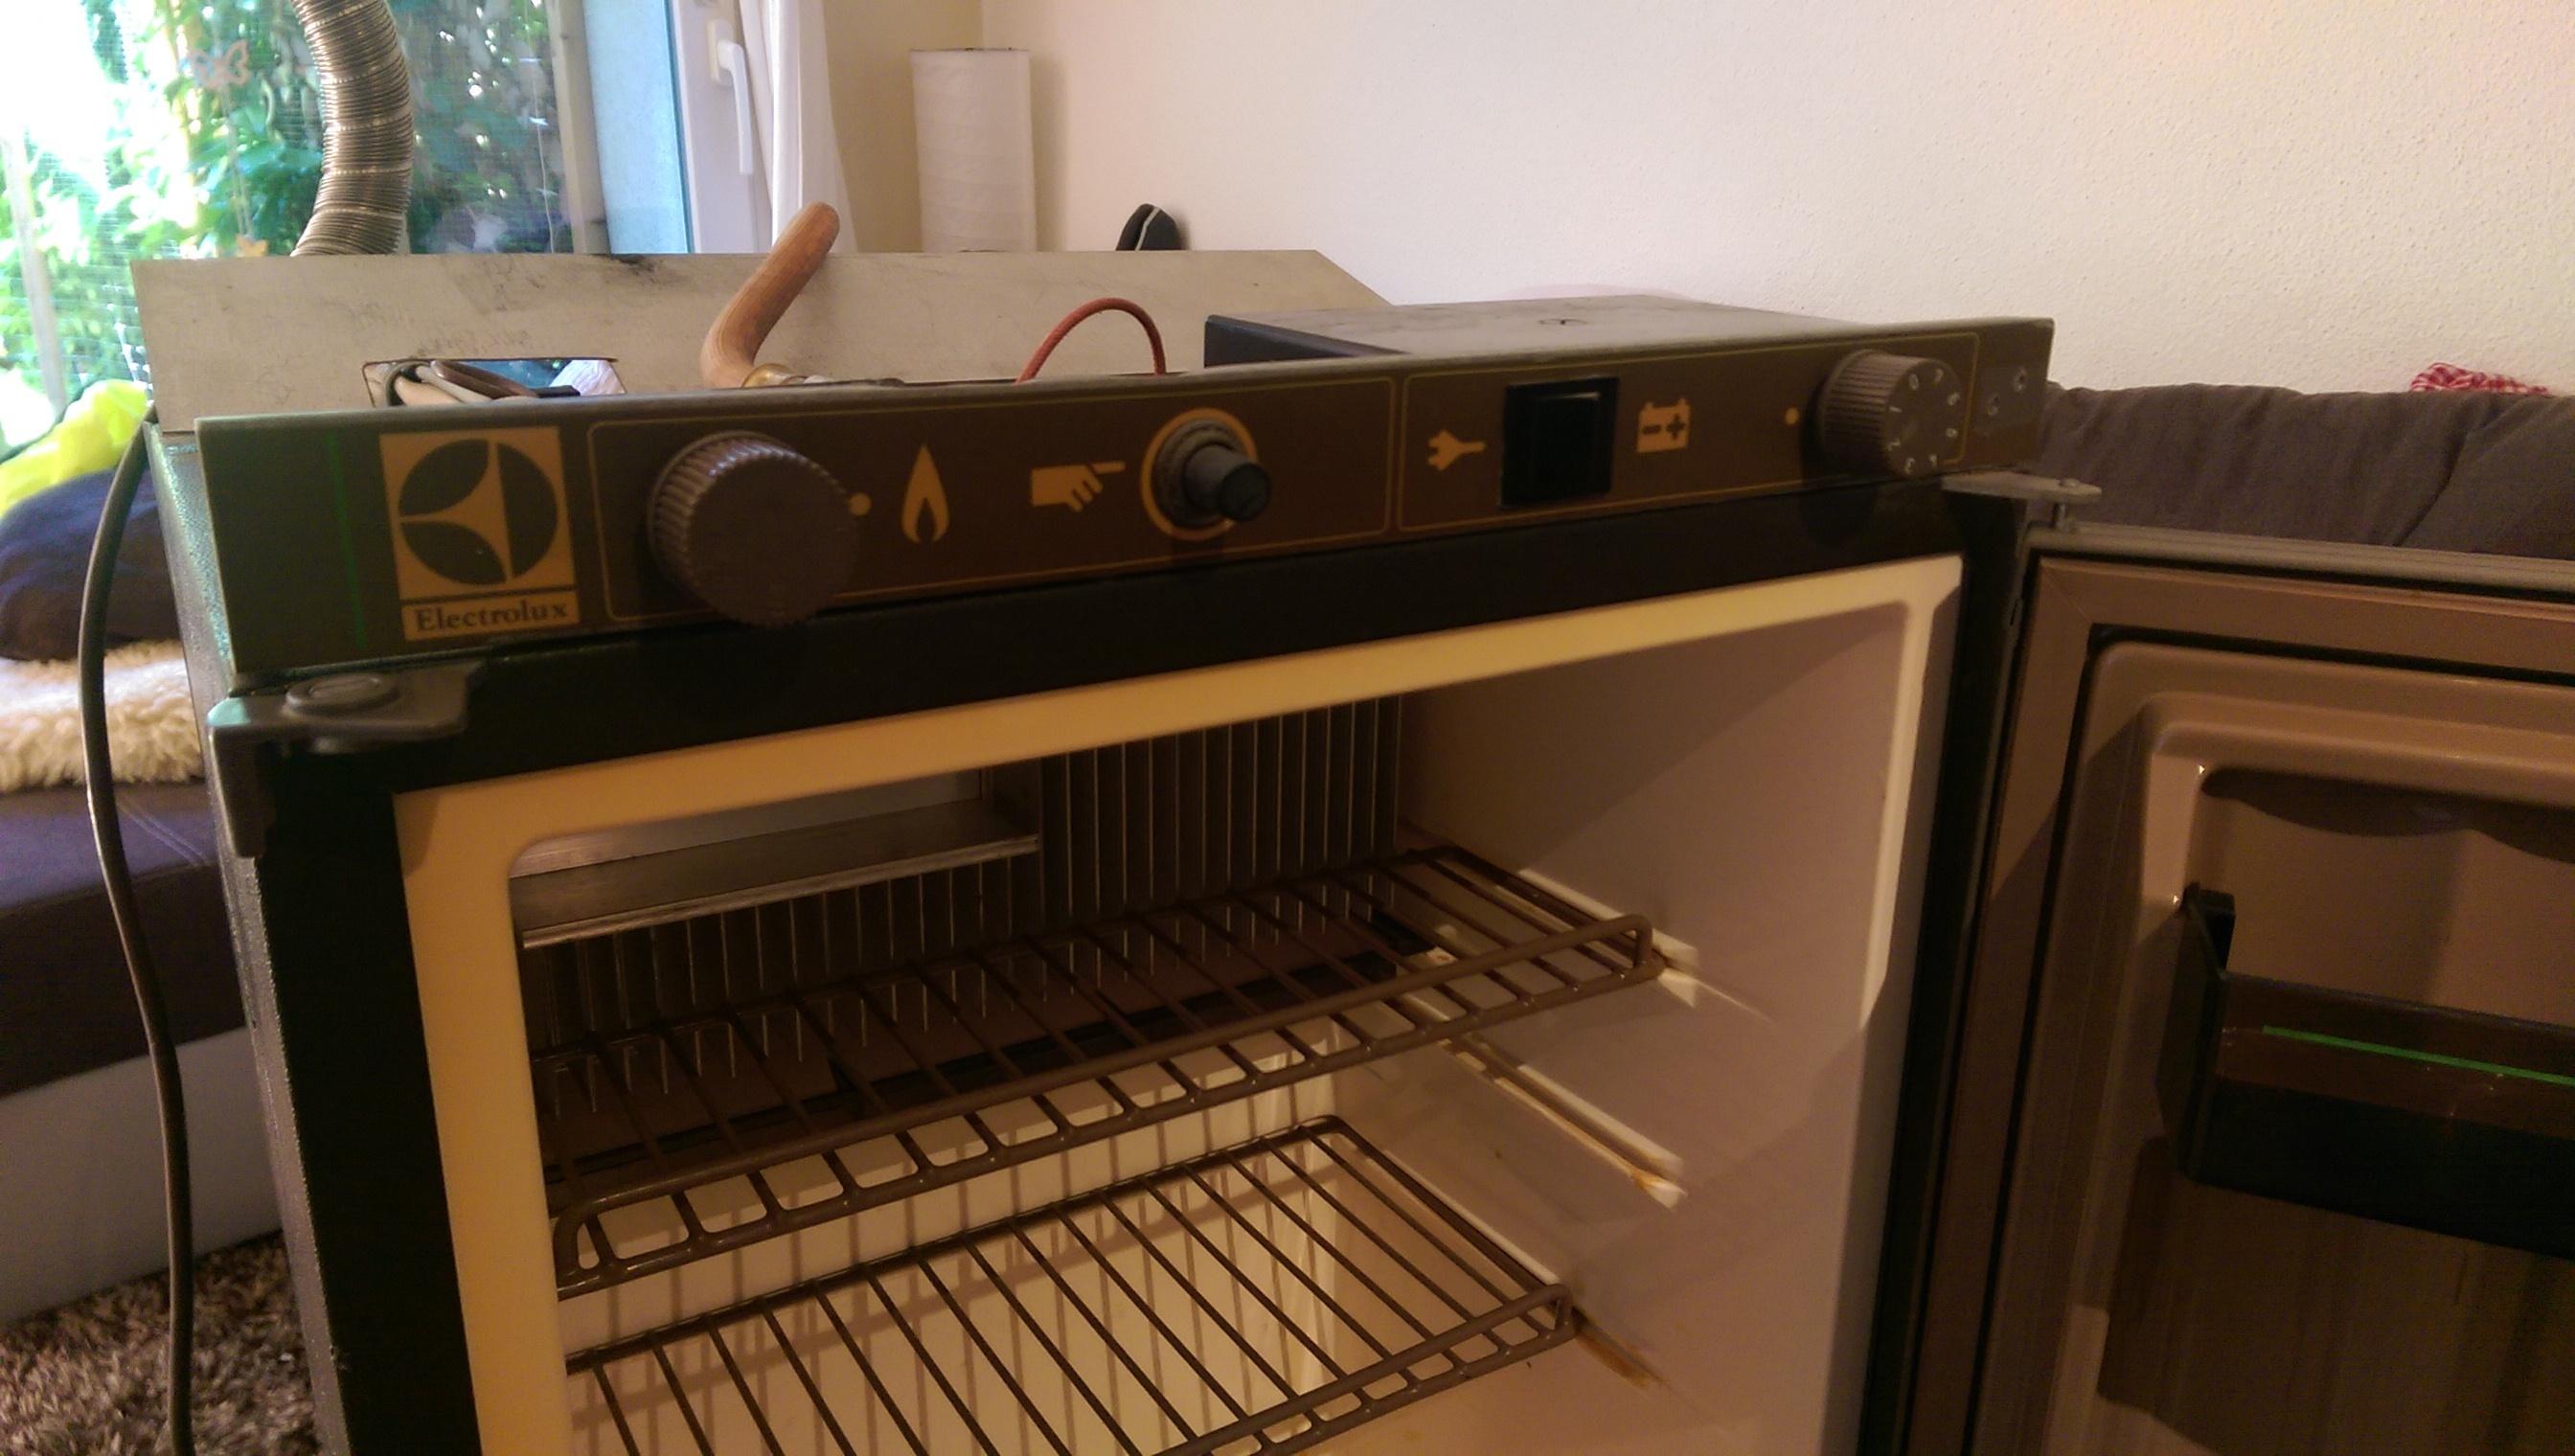 Kühlschrank Elektrolux : Elektrolux rm 185 gl kühlschrank biete vwbusforum.ch